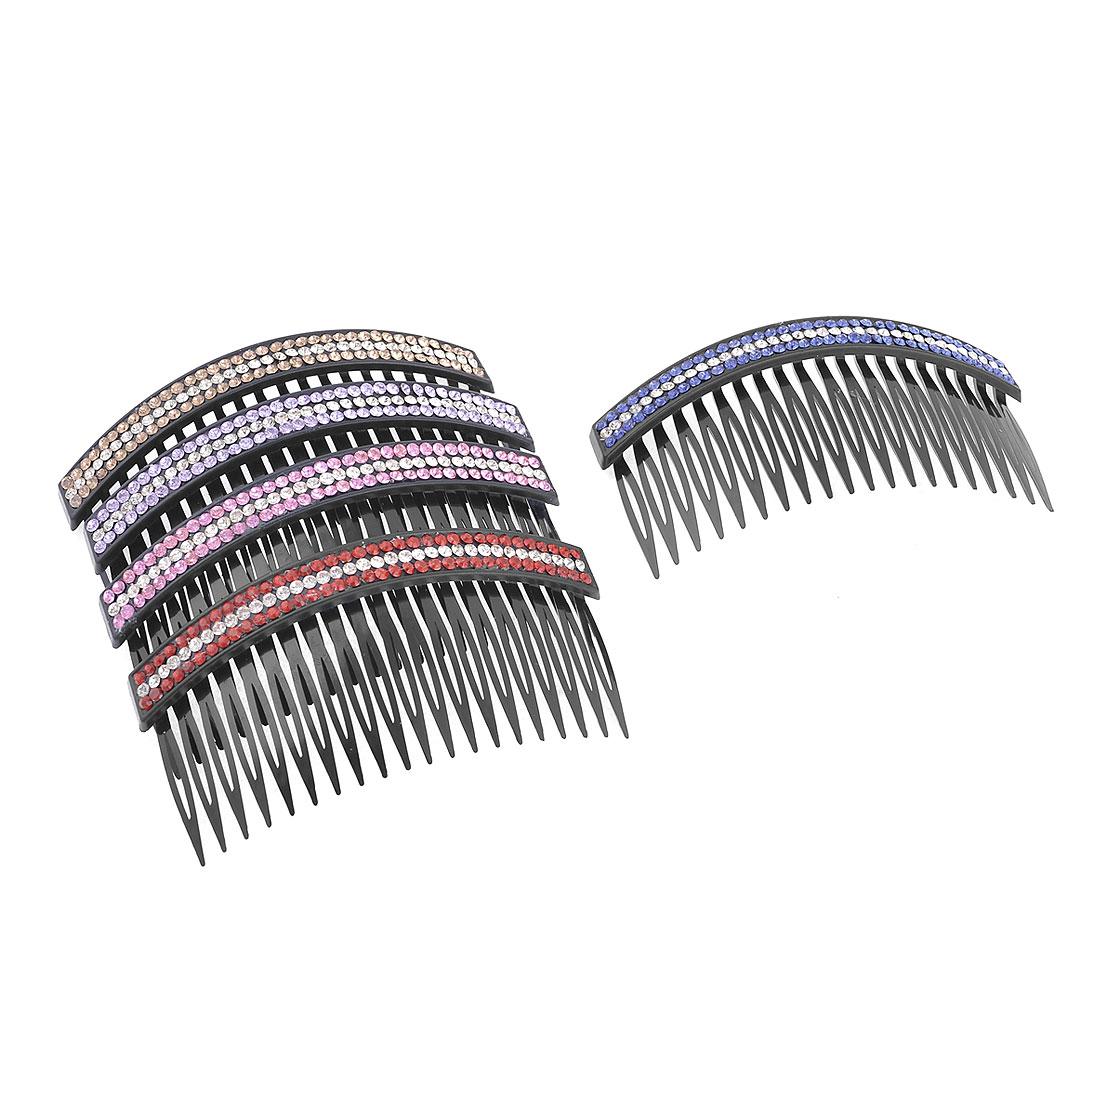 5 Pcs Hair Decorative Colorful Shiny Rhinestones Accent Hair Comb Clip Claw Black